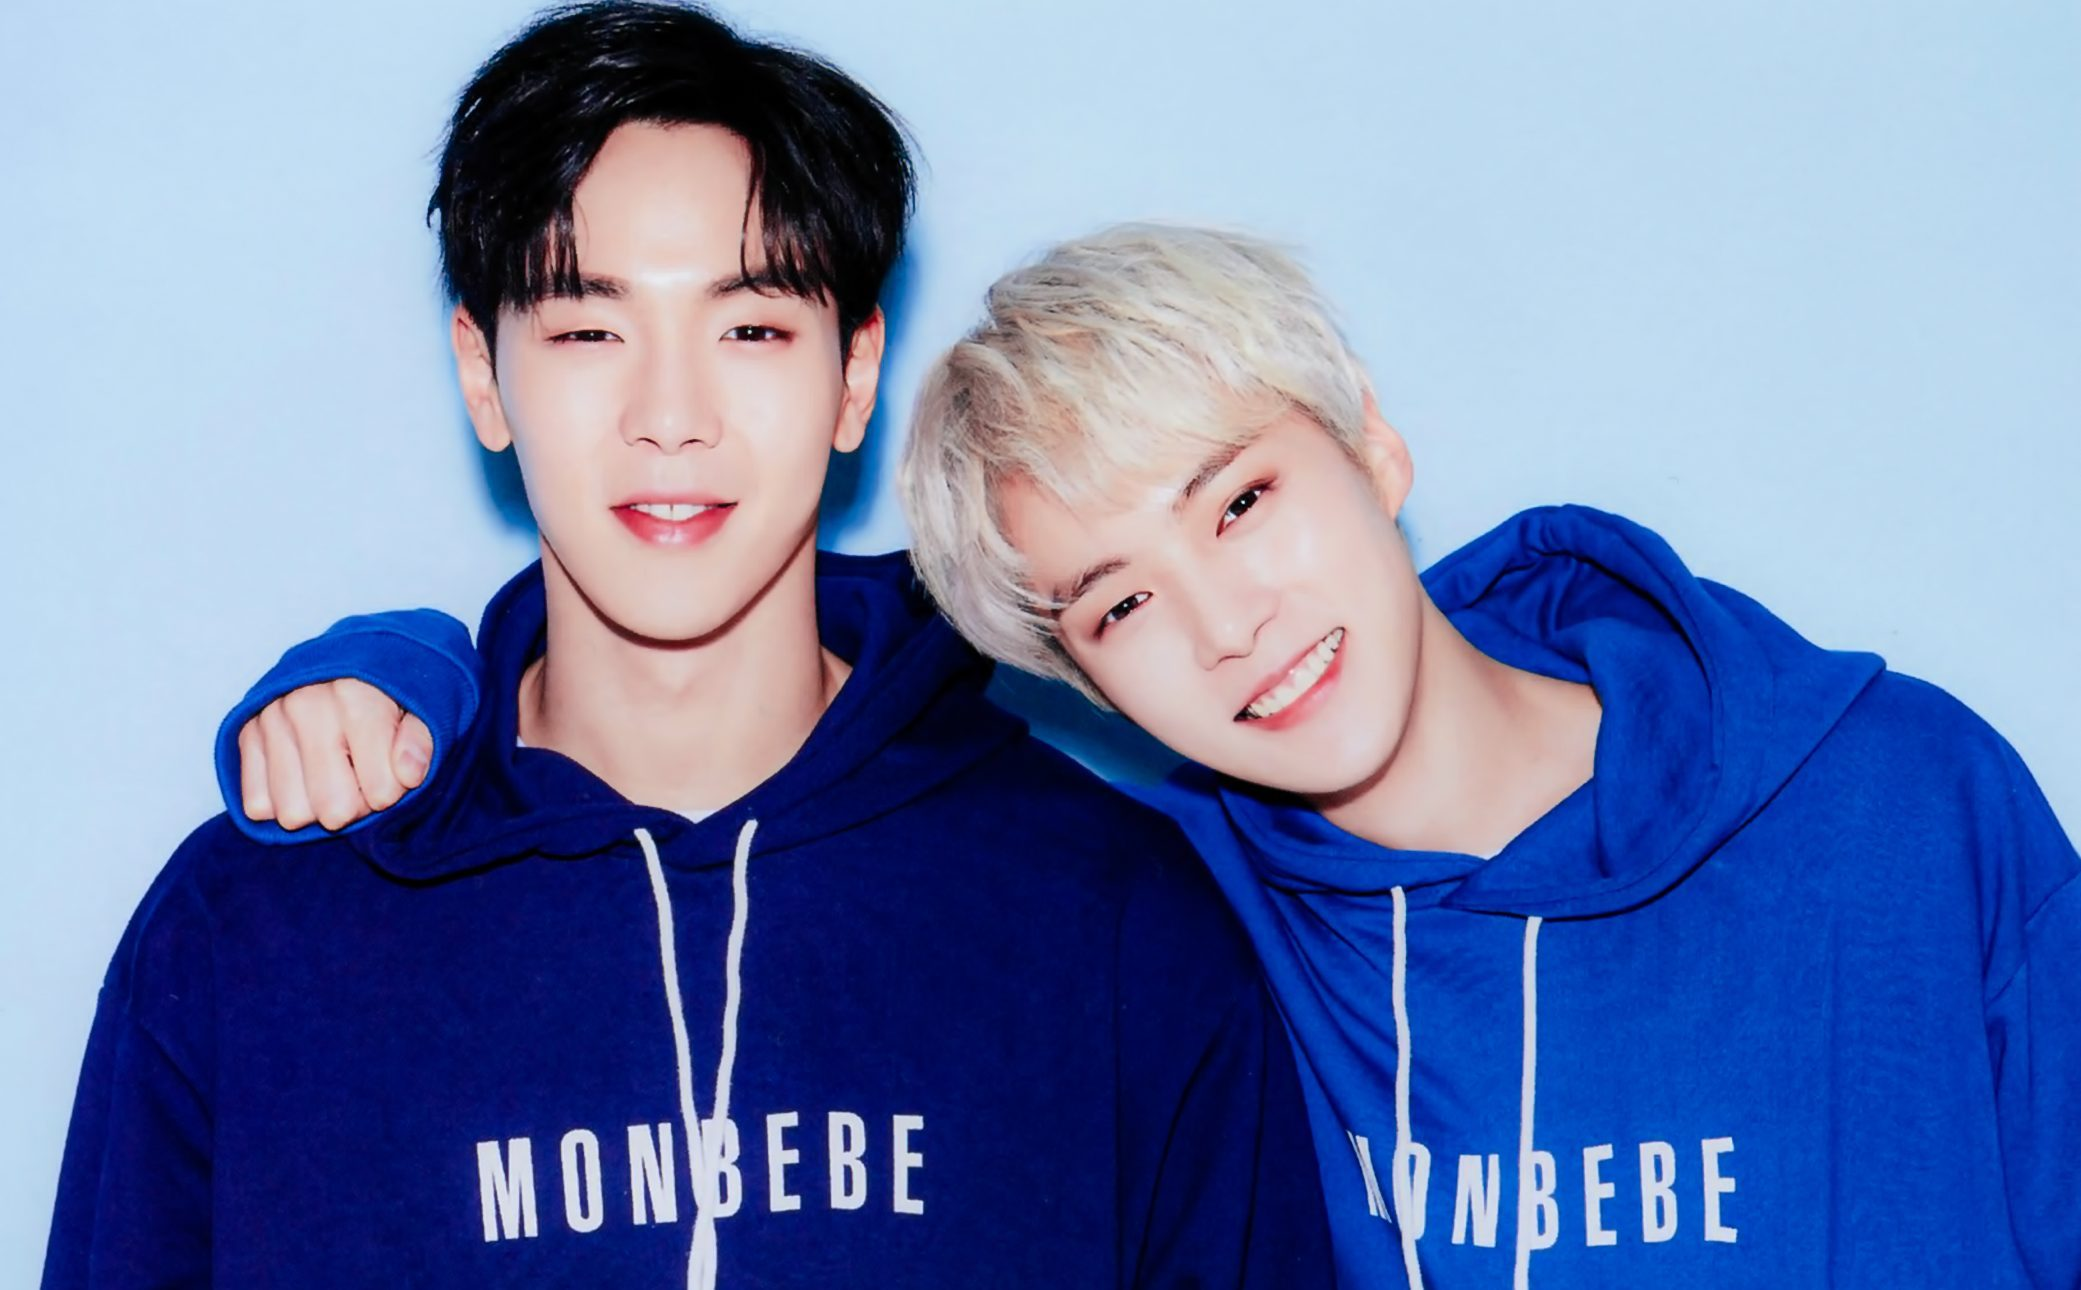 MONSTA X's Shownu And Minhyuk To Reveal Their Sweet Webtoon OST Single Soon